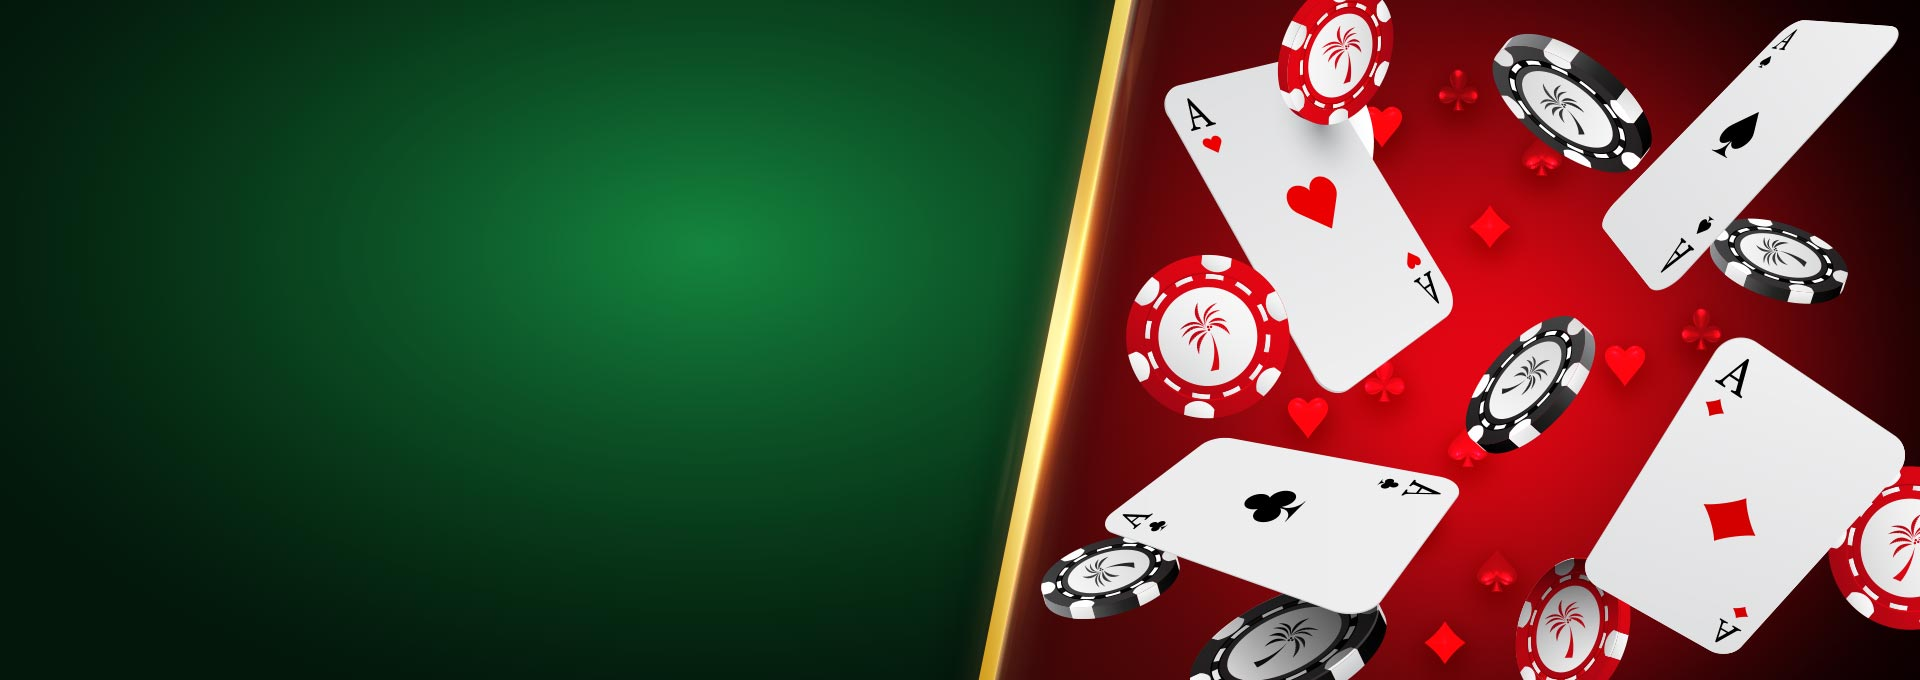 Casino eldorado онлайн казино обзор